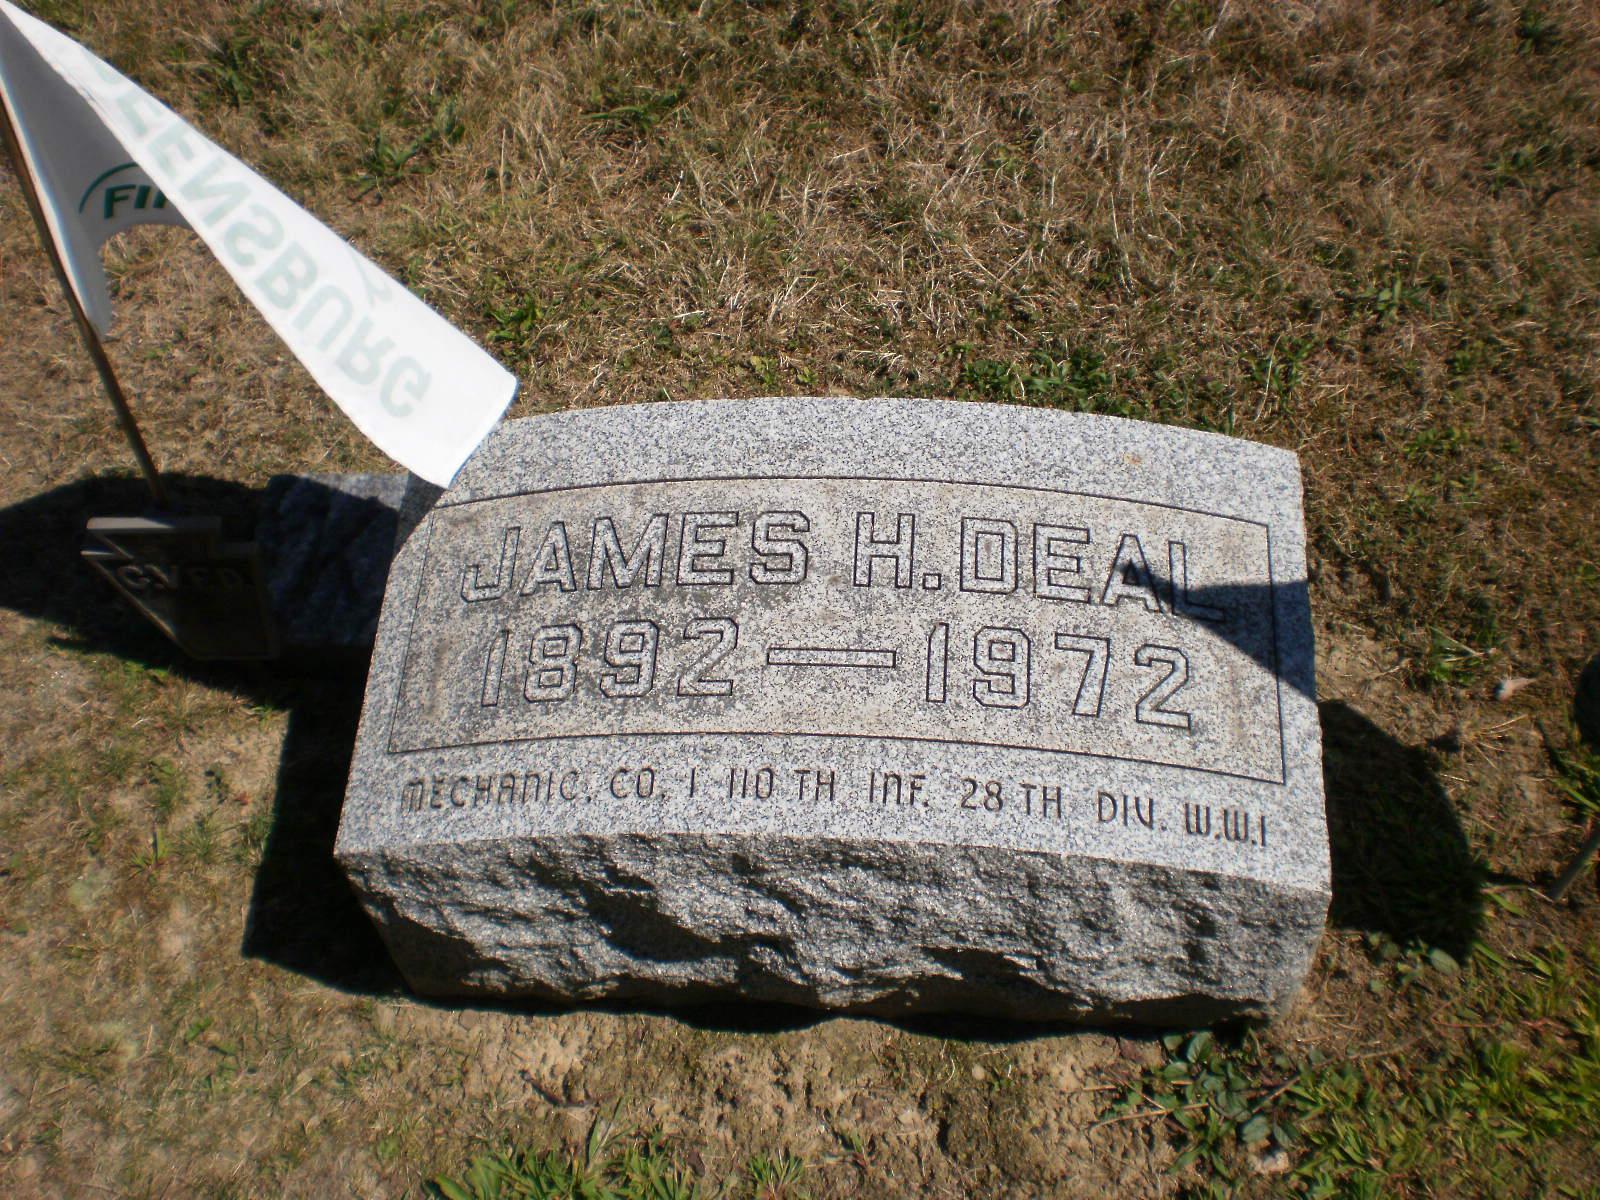 James M Deal